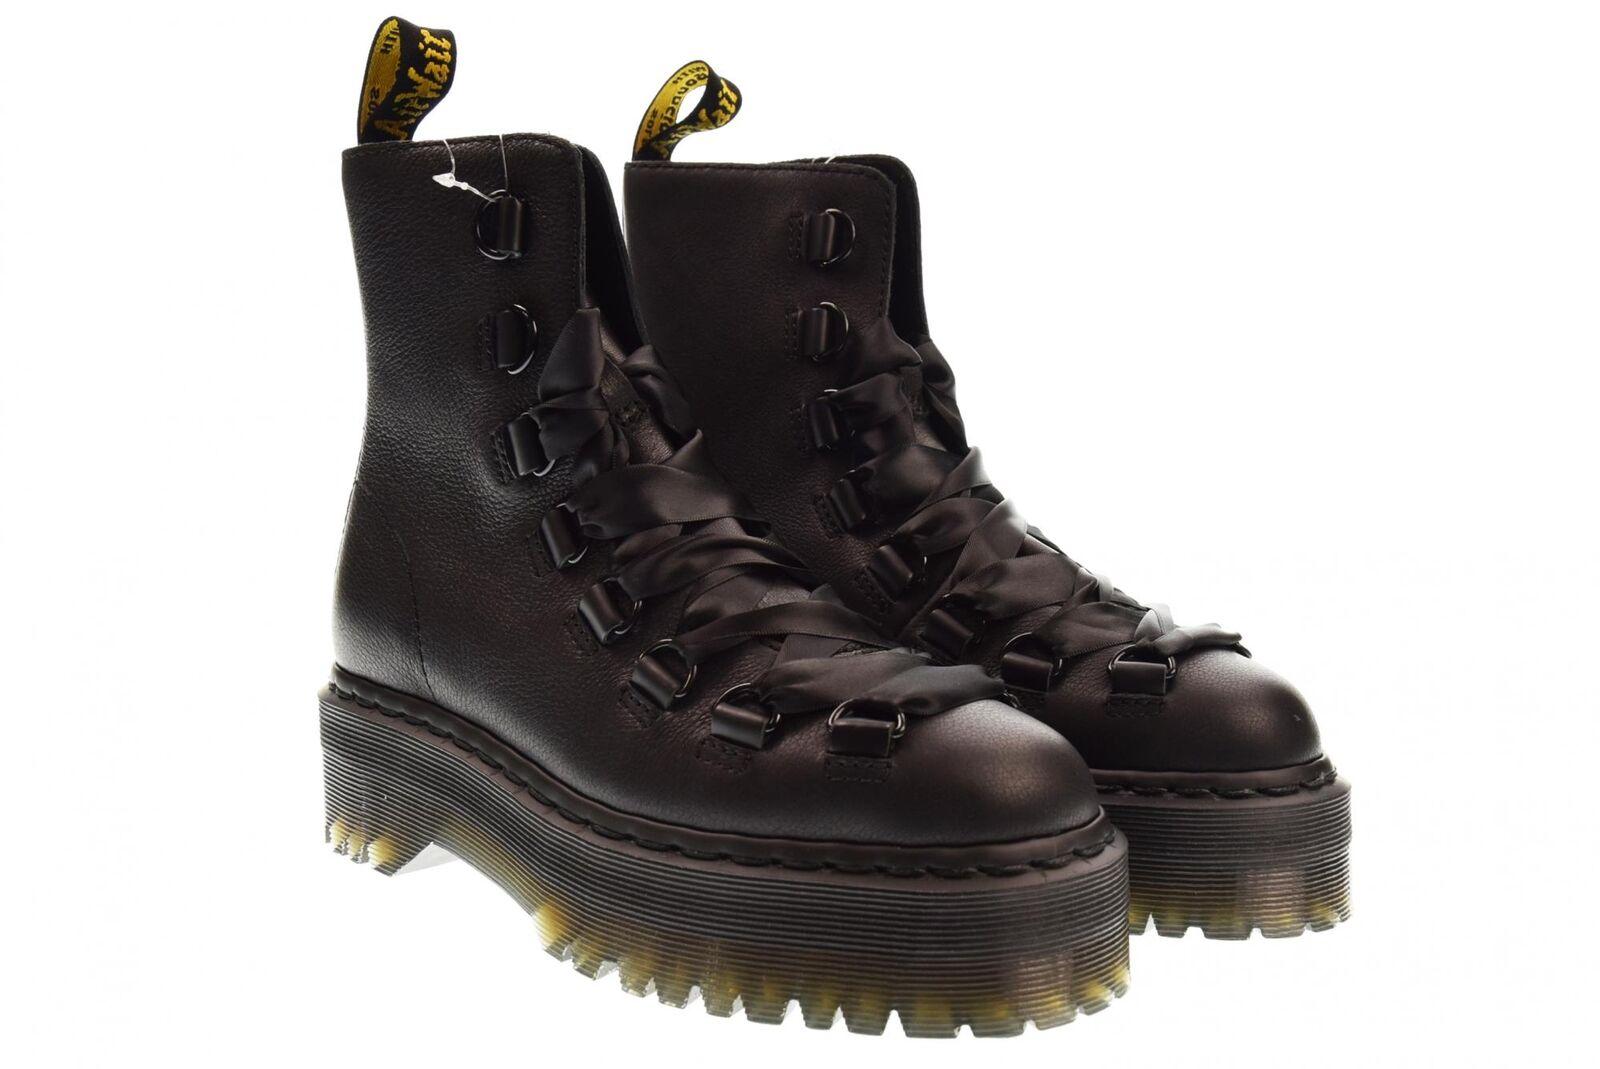 Dr.Martens scarpe donna anfibio con platform 24404033 TREVONNA PISA SMOOTH A18